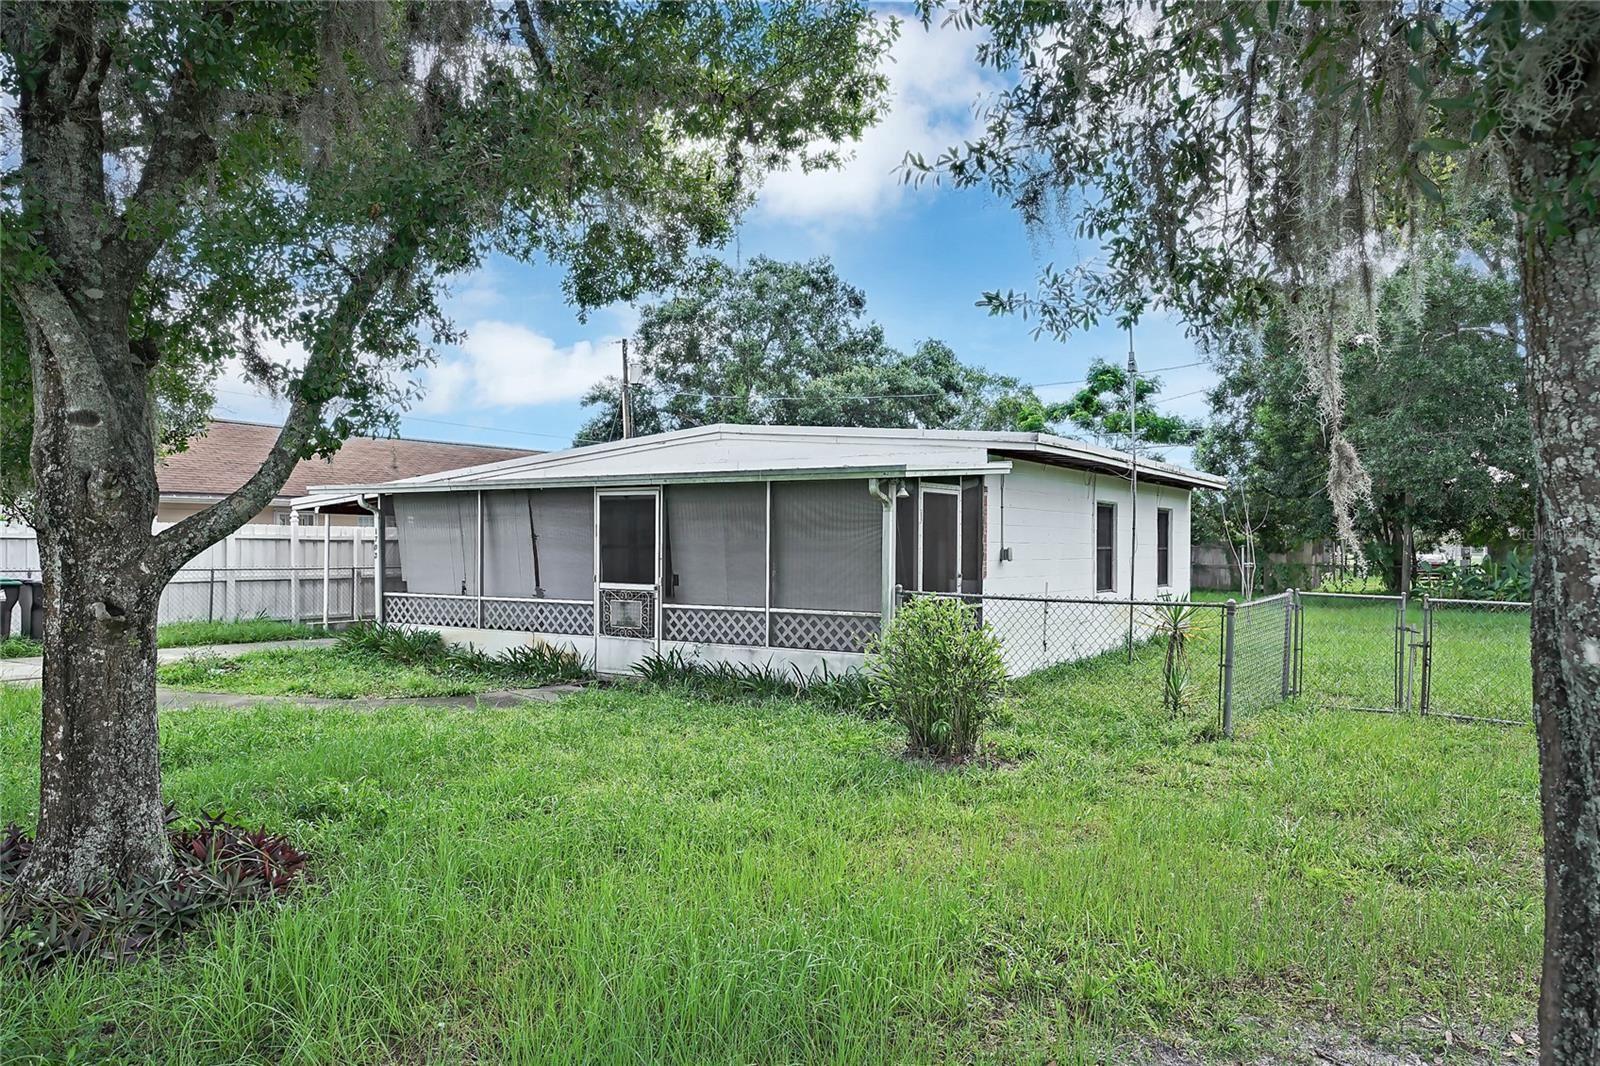 1703 GATTIS DRIVE, Orlando, FL 32825 - #: O5962975